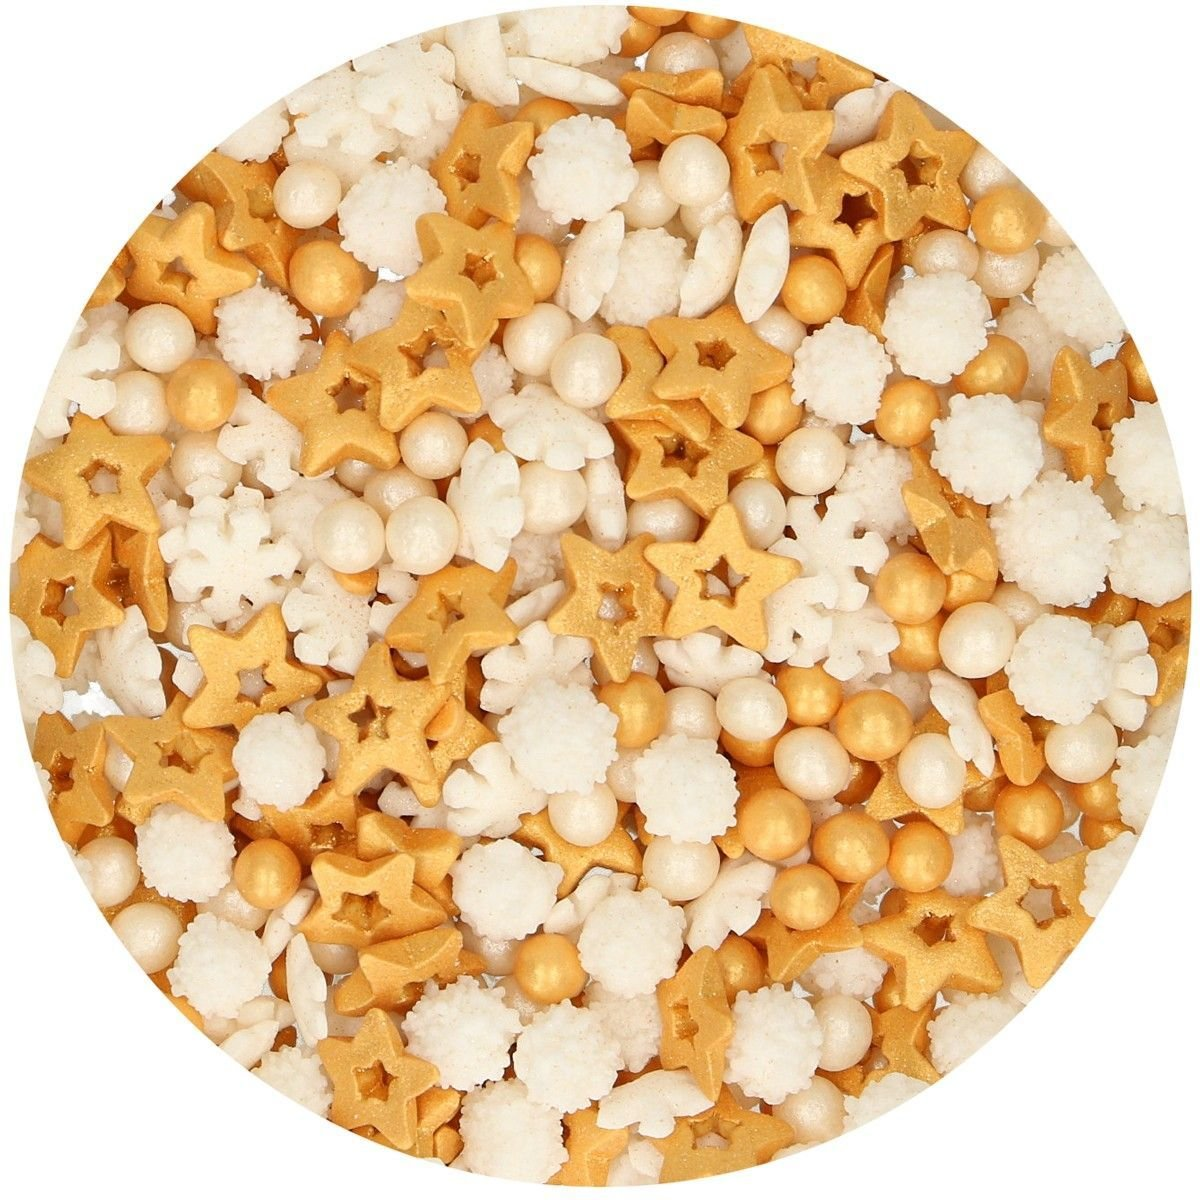 FunCakes Sprinkle Mix 180γρ -GOLD MEDLEY -Μείγμα  Ζαχαρωτών - Χρυσό